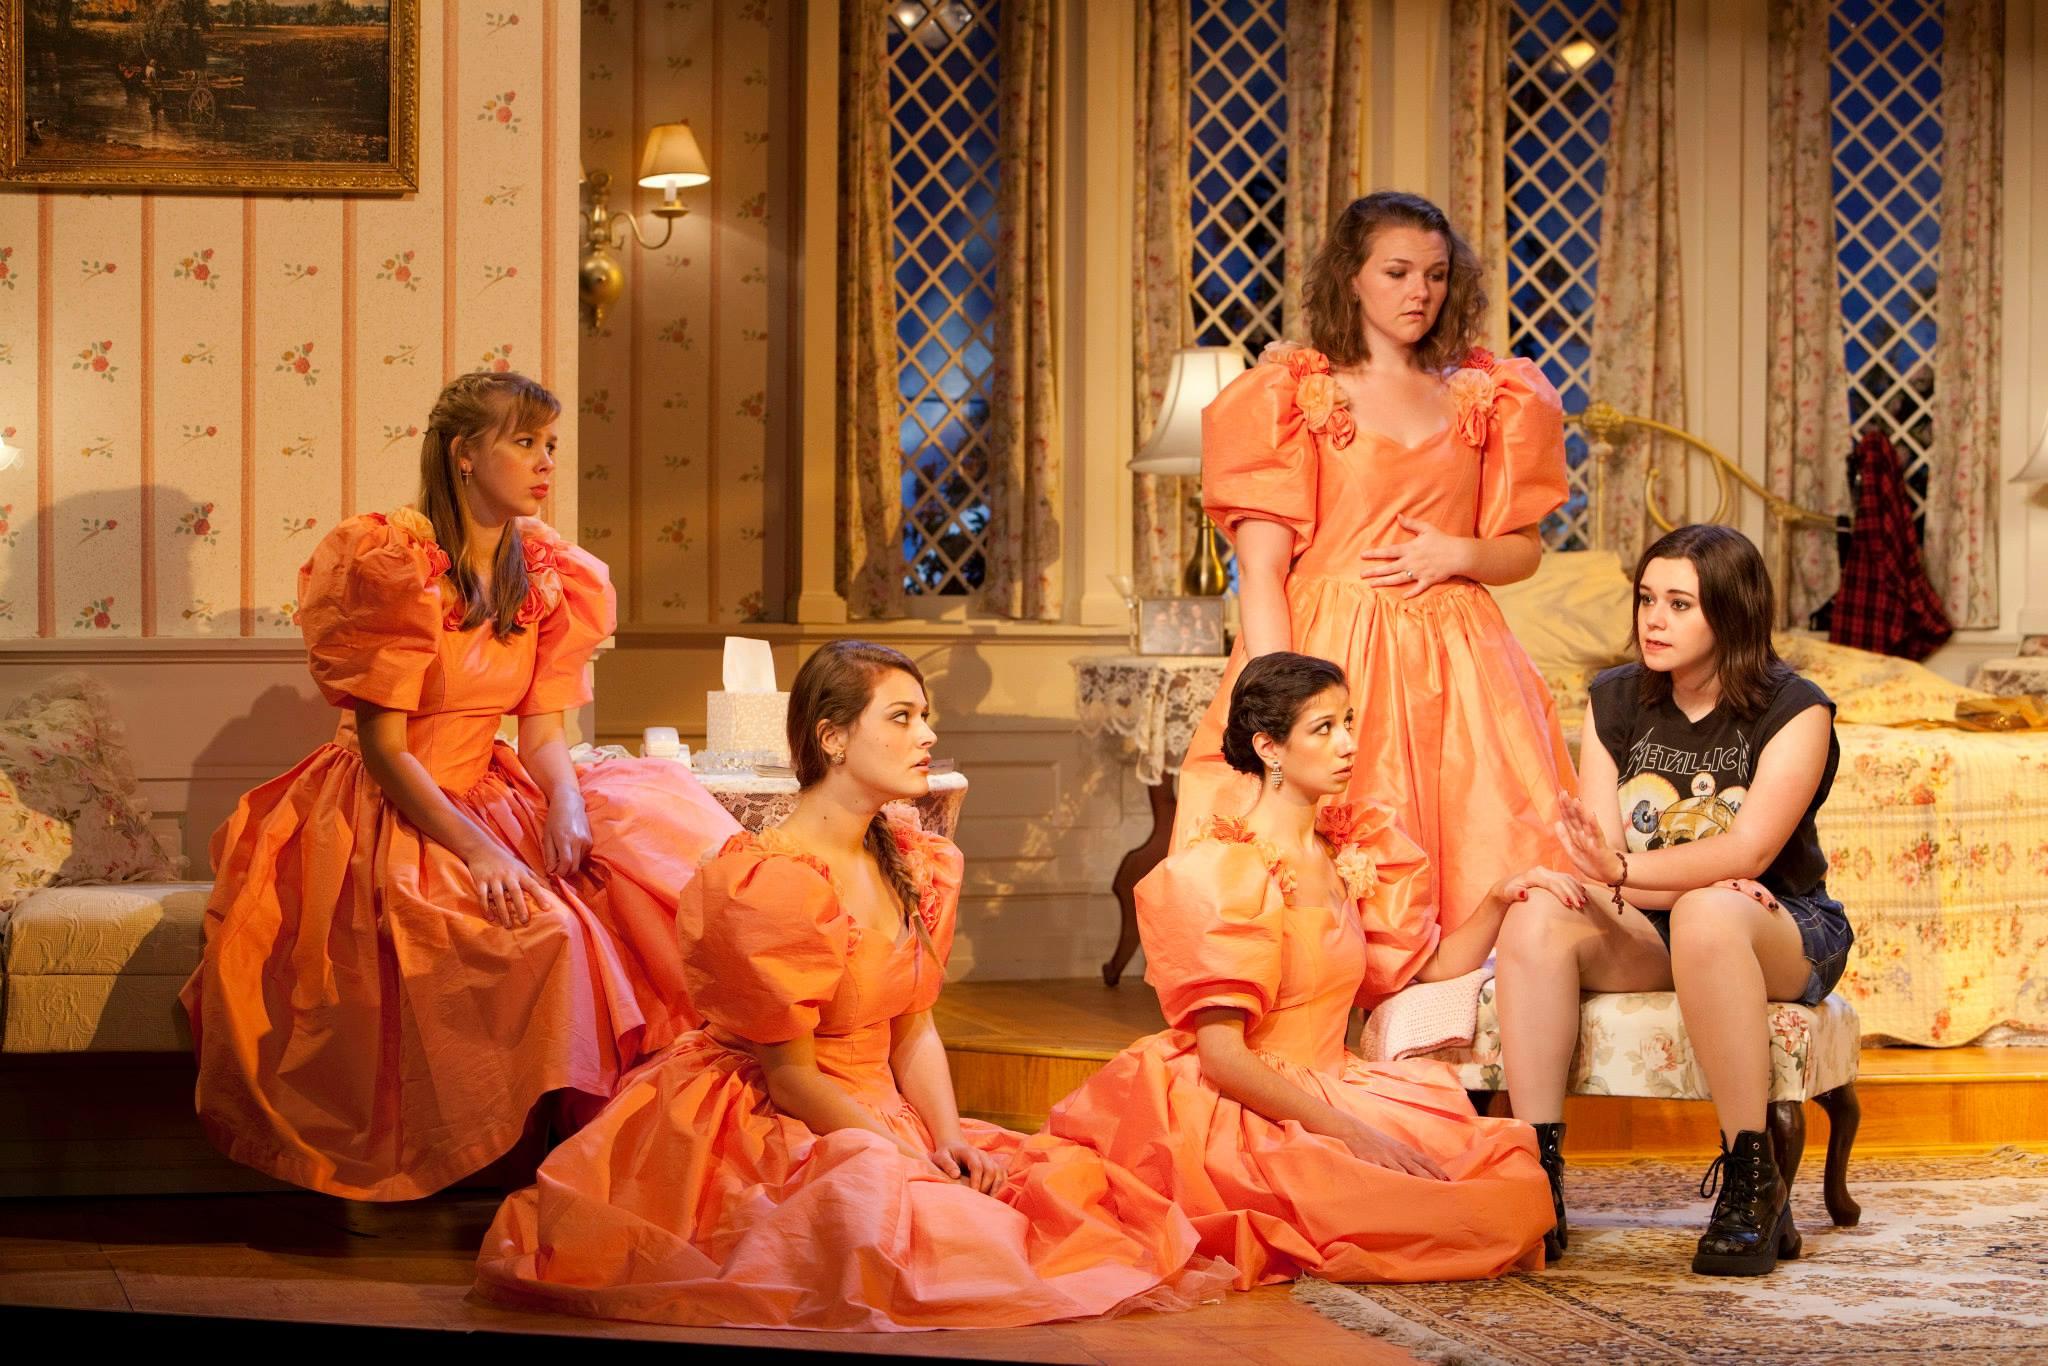 Five Women Wearing the Same Dress Photo 05